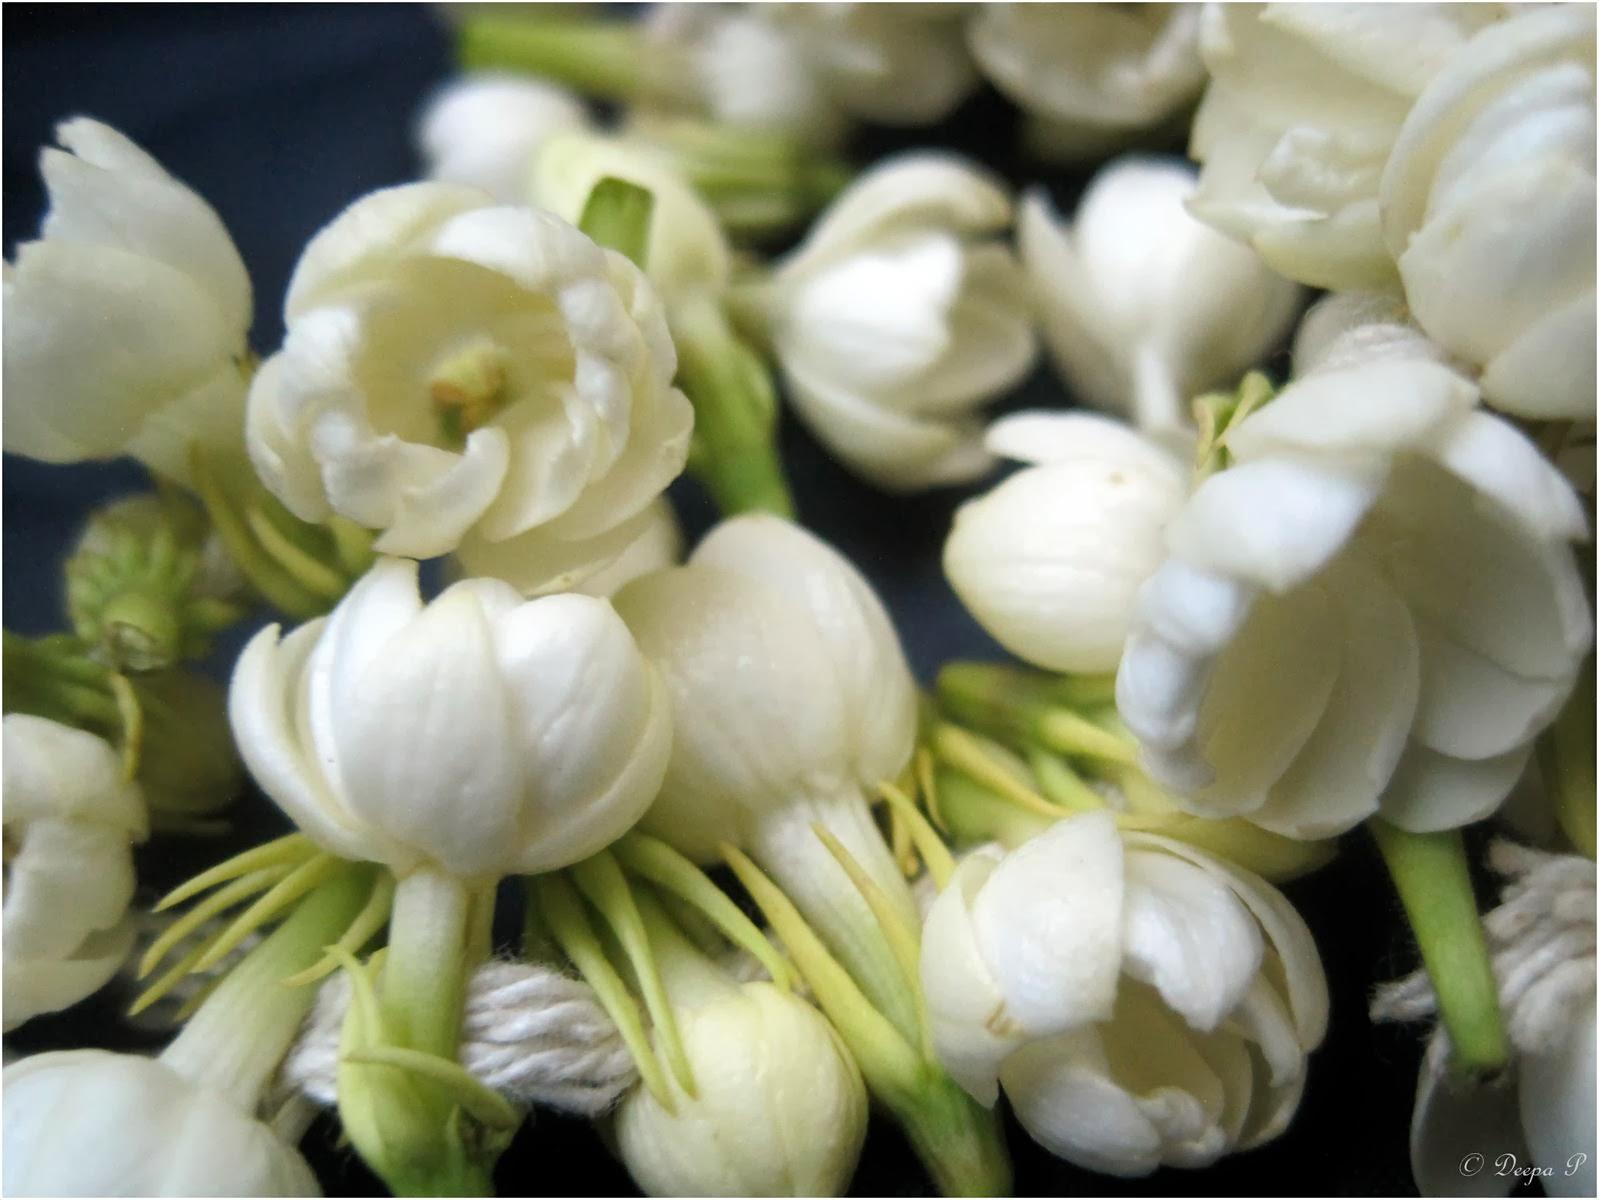 A to z challenge j jasminum sambac flower indian jasmine flower sniffing mogra happily izmirmasajfo